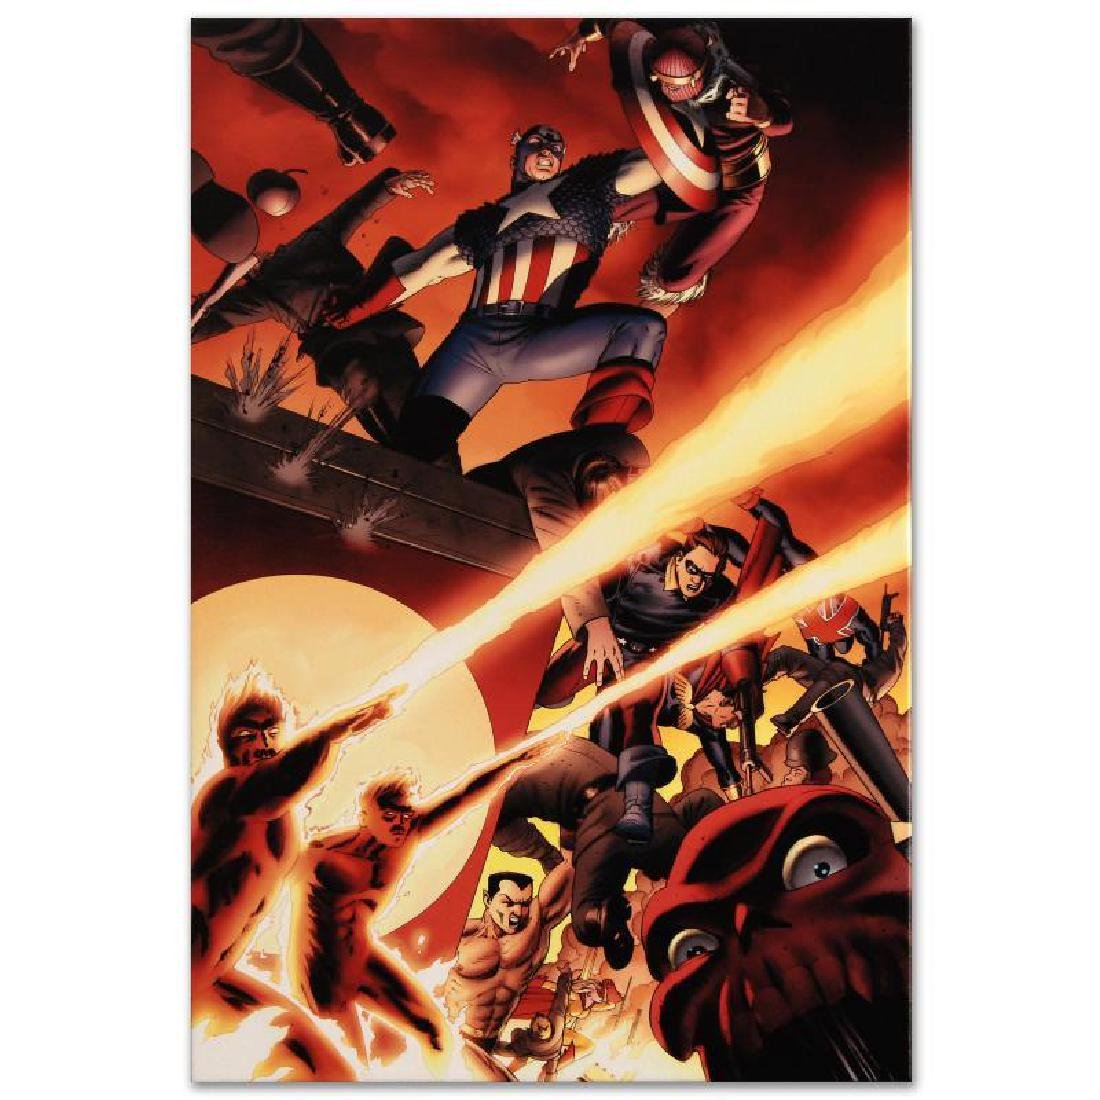 Fallen Son: Death of Captain America #5 by Marvel